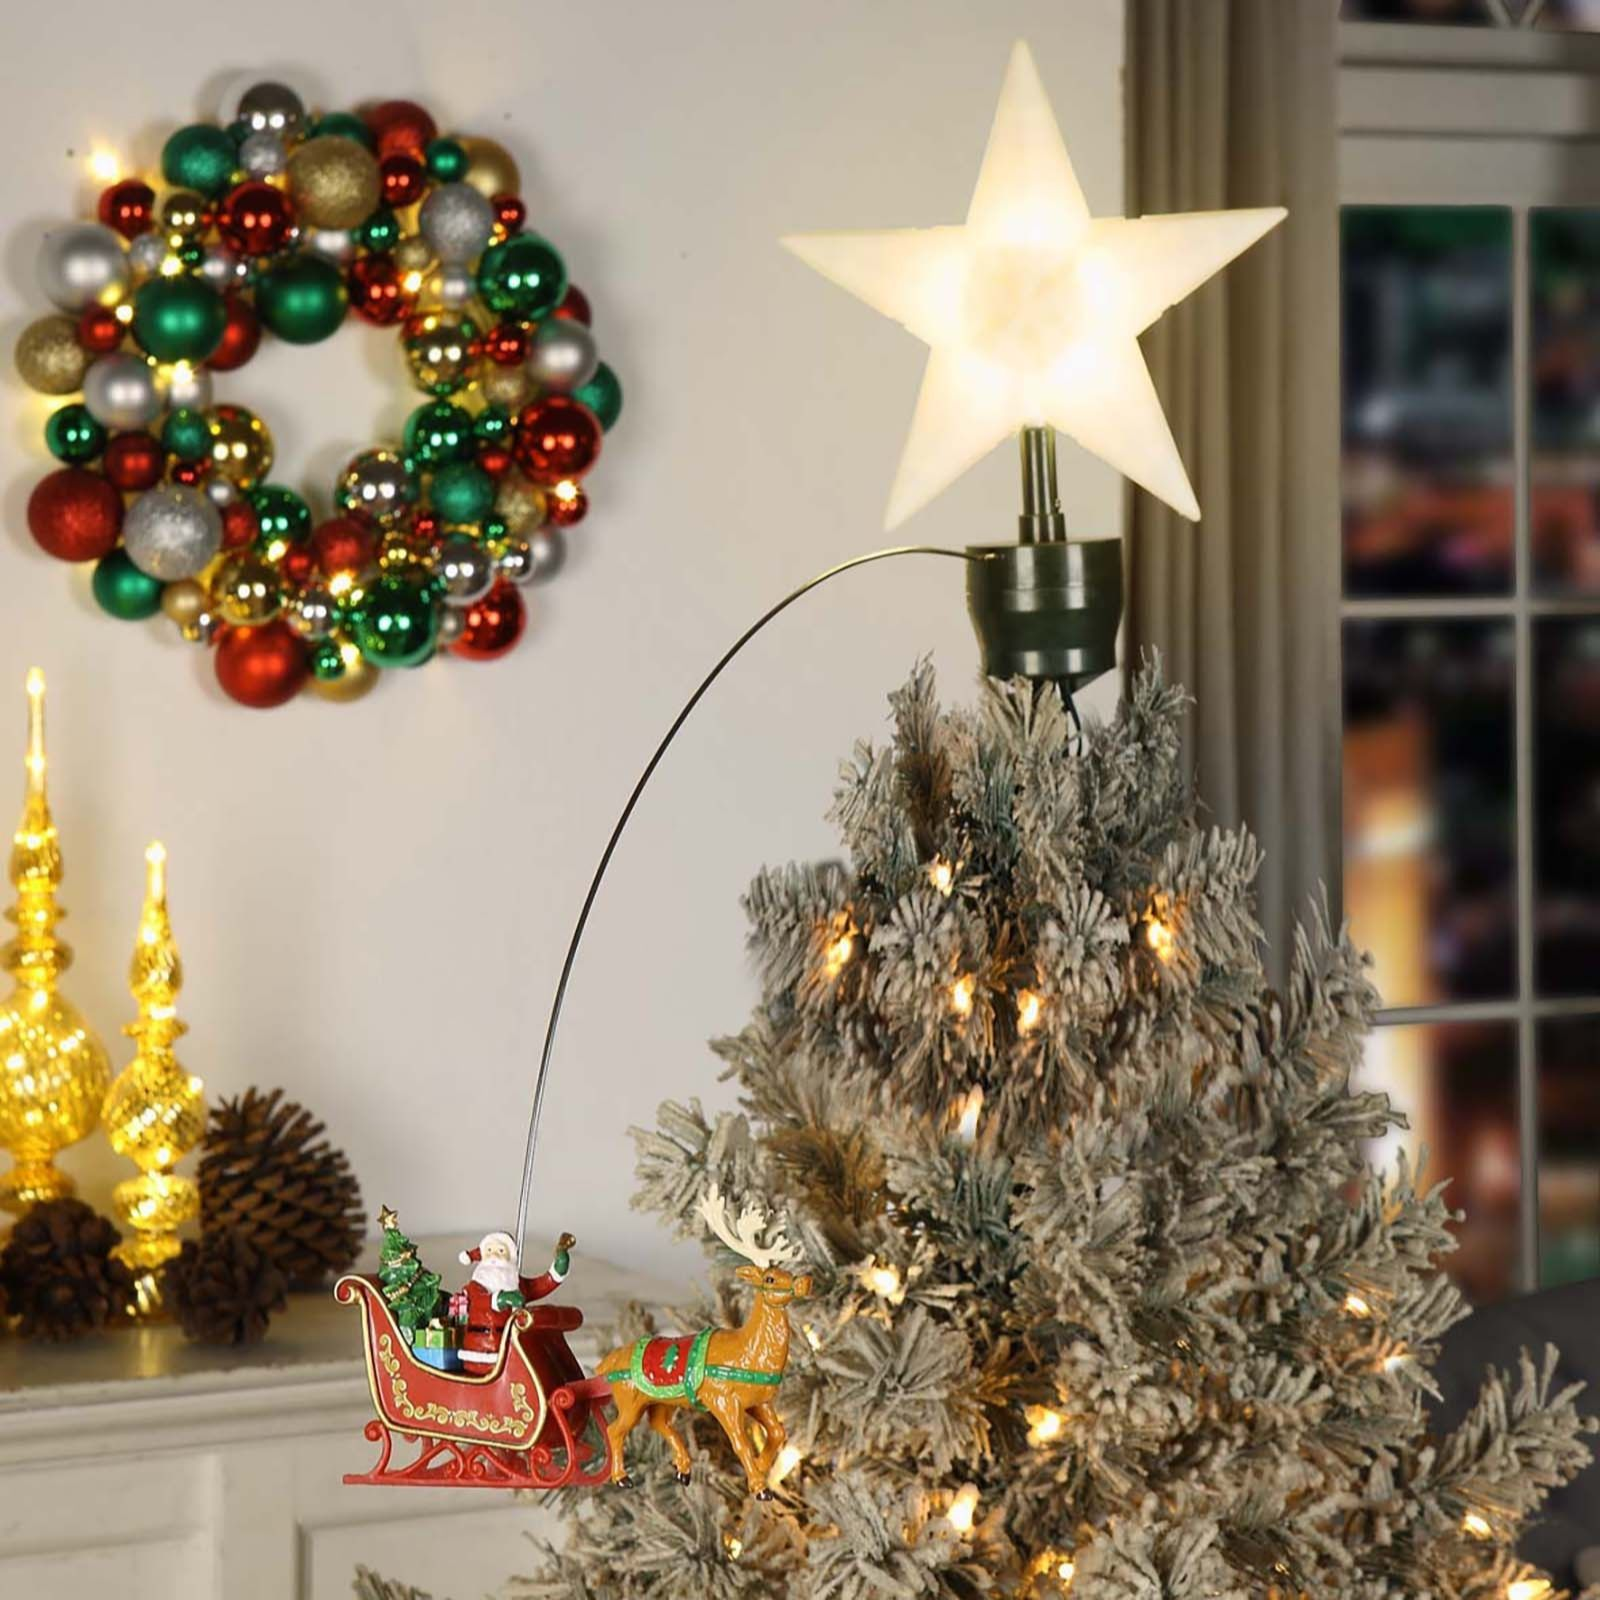 Mr Christmas Animated Tree Topper QVC UK